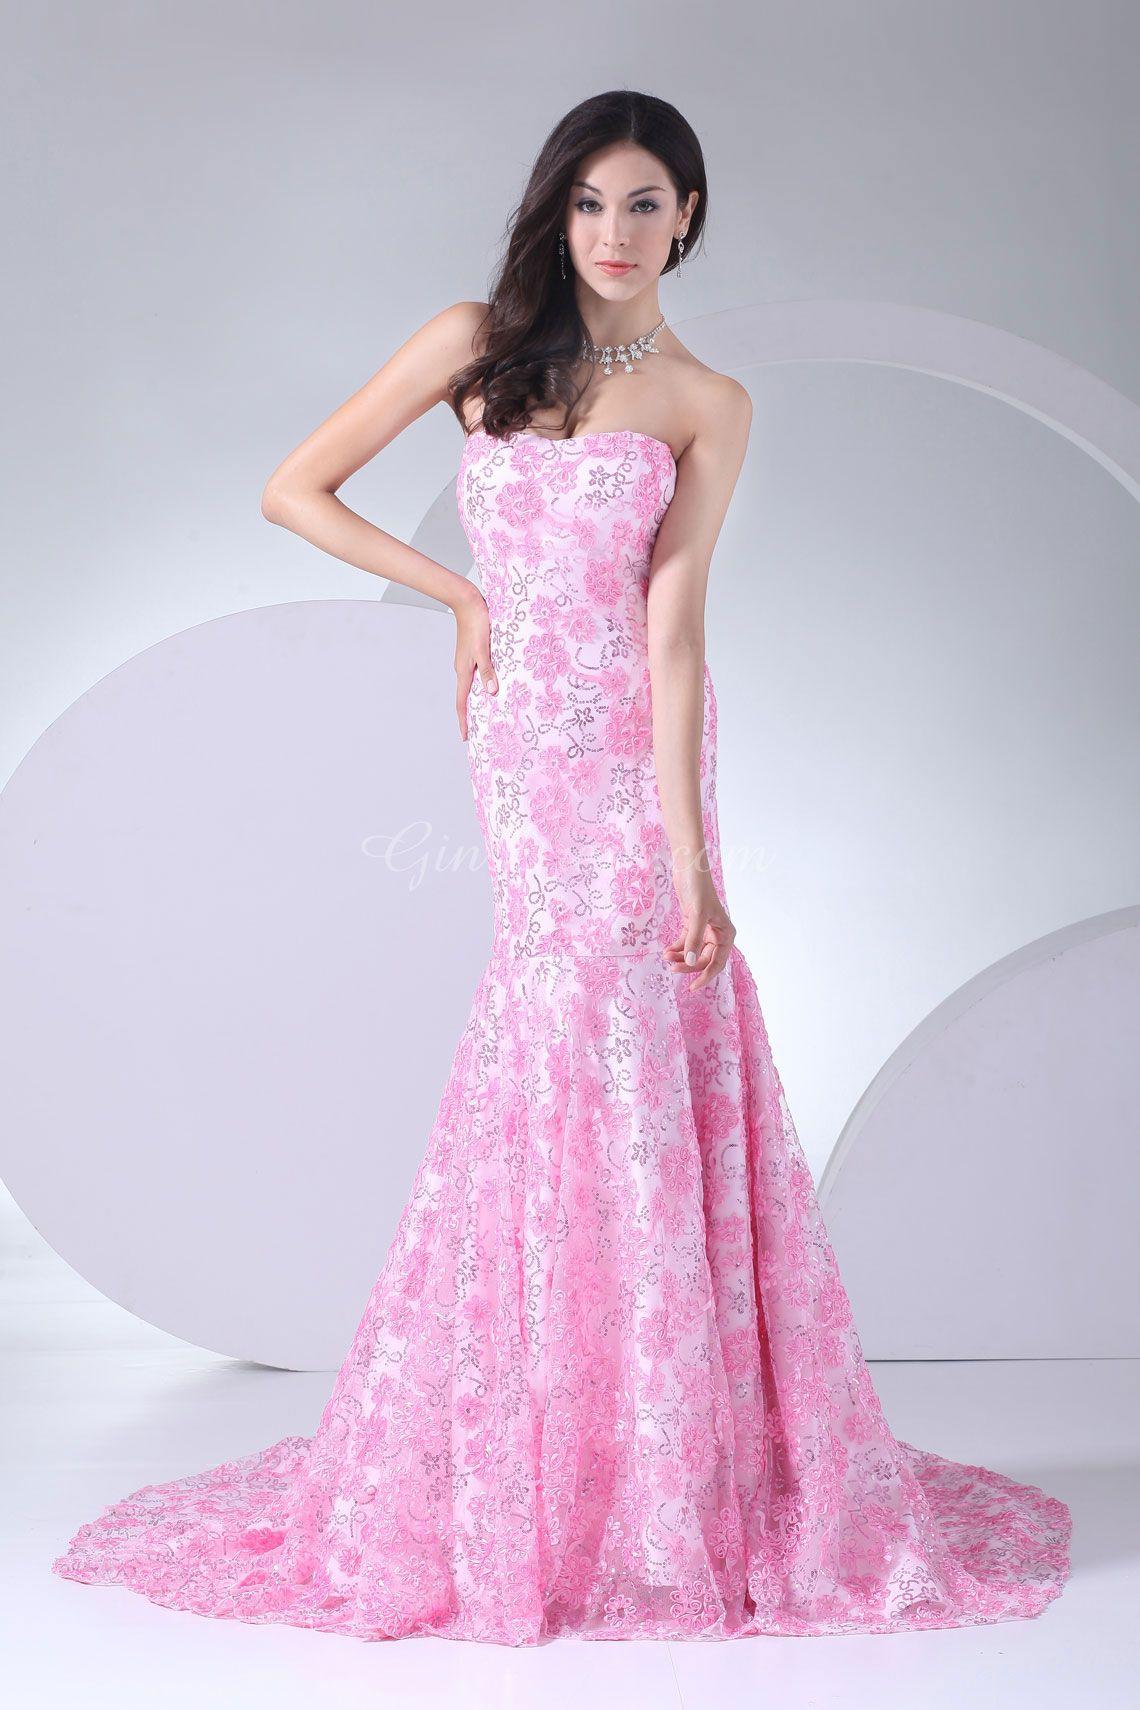 100 dollar wedding dress  prom dress prom dresses   Clothing  Dress Up   Pinterest